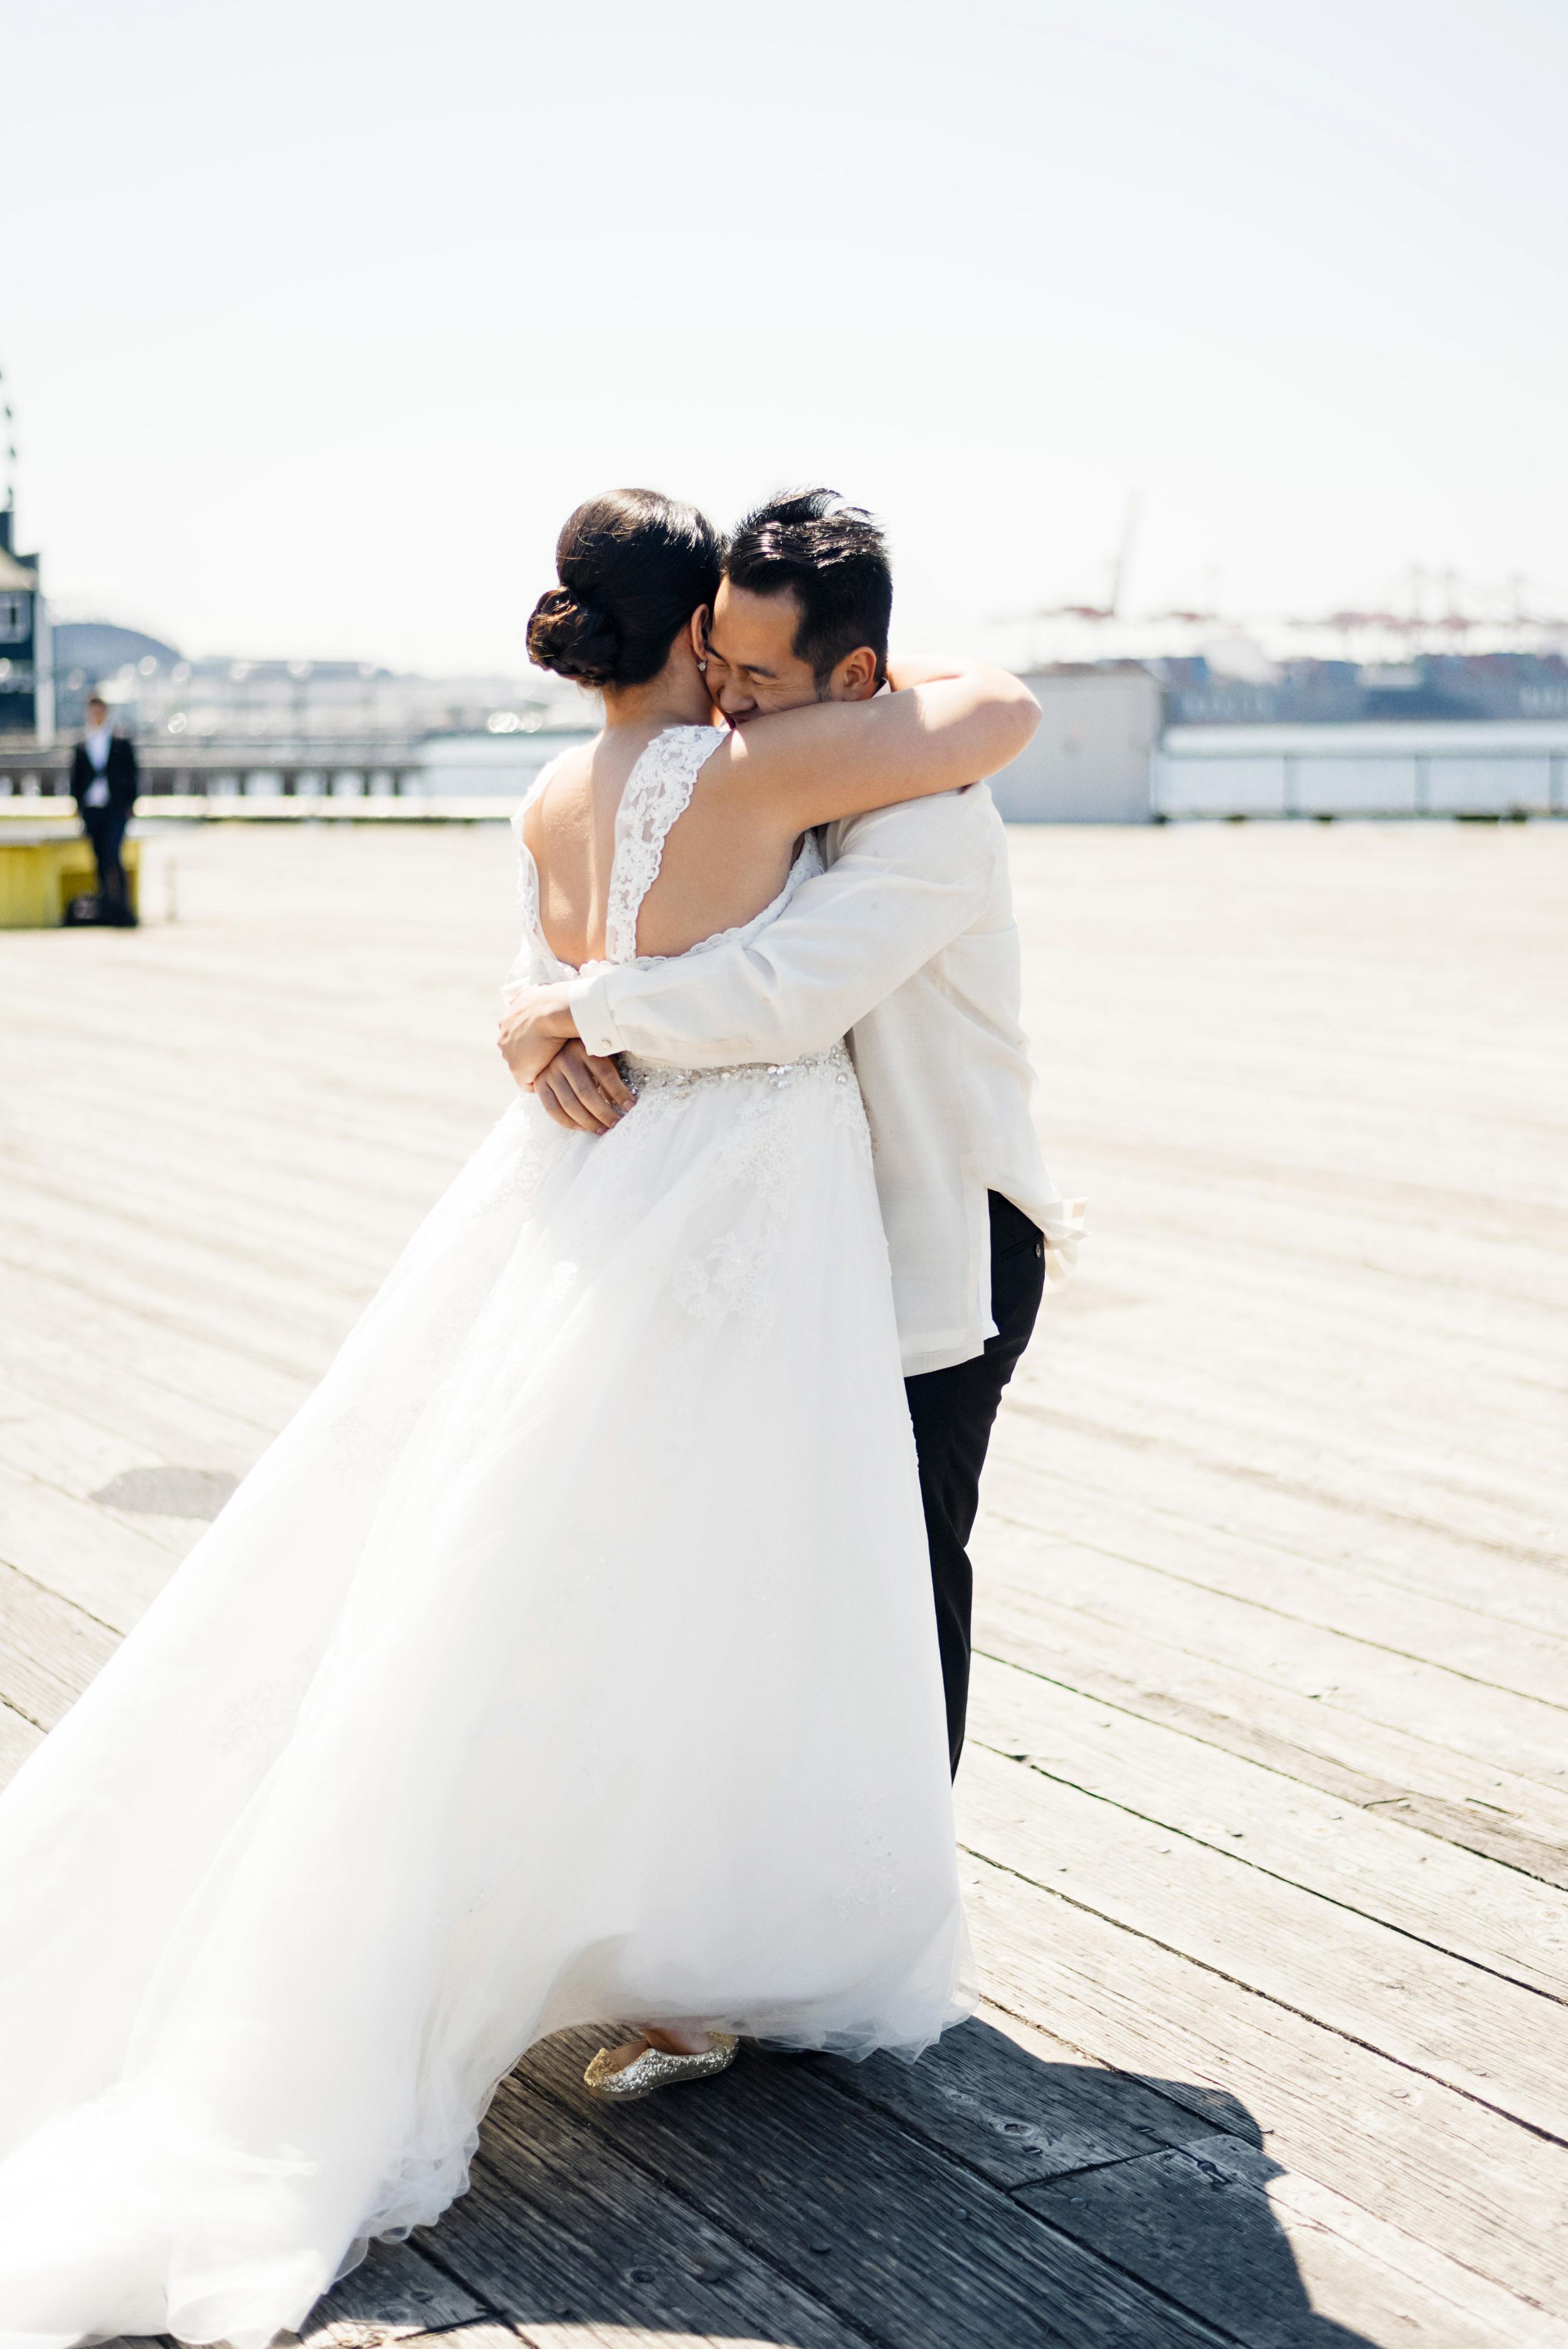 First Look Photo | Joe and Patience Photography | Filipino Wedding Planner | Seattle Wedding Planner | Ballard Bay Club Wedding